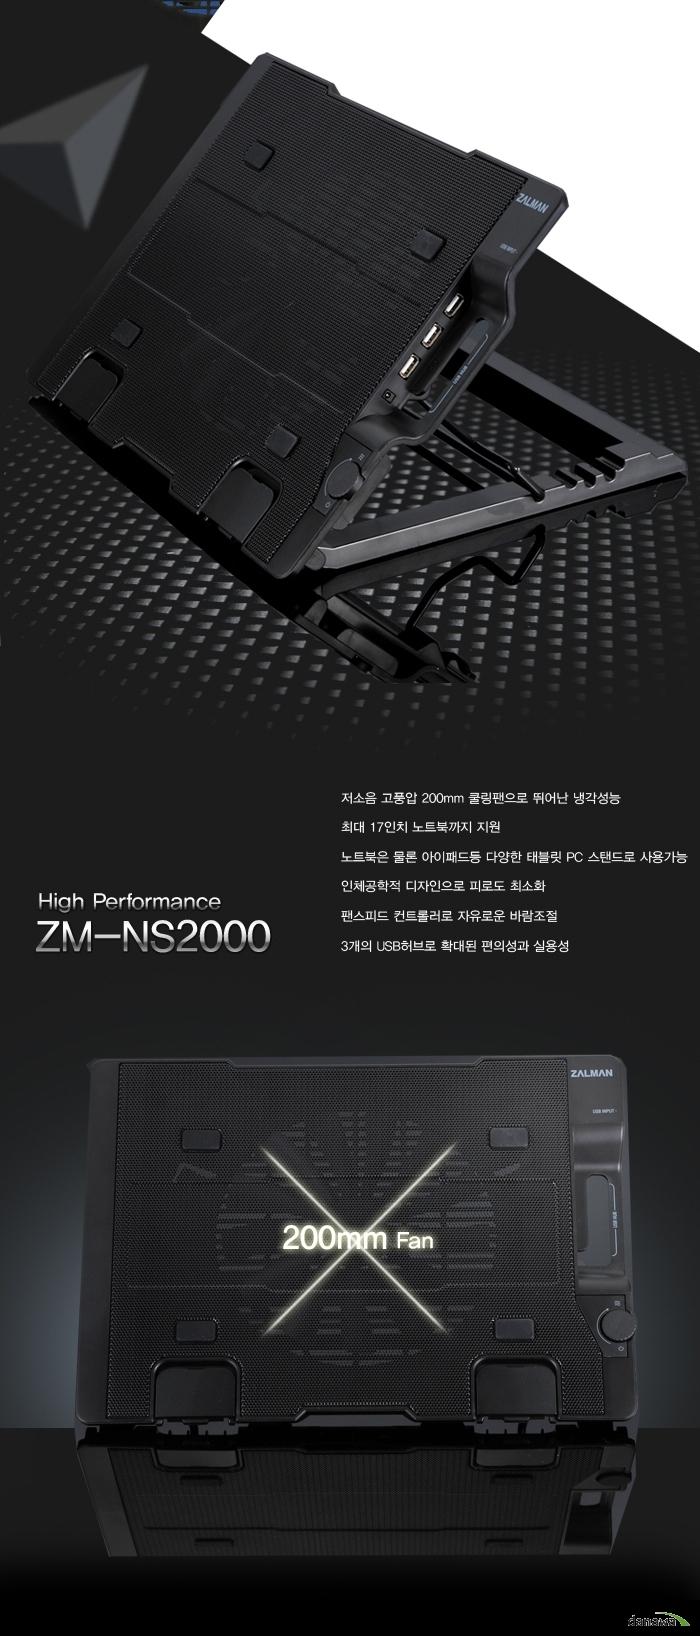 High Performance ZM-NS2000 저소음 고풍압 200mm 쿨링팬으로 뛰어난 냉각성능 최대 17인치 노트북까지 지원 노트북은 물론 아이패드 등 다양한 태블릿 PC 스탠드로 사용가능 인체공학적 디자인으로 피로도 최소화 팬스피드 컨트롤러로 자유로운 바람조절 3개의 USB 허브로 확대된 편의성과 실용성